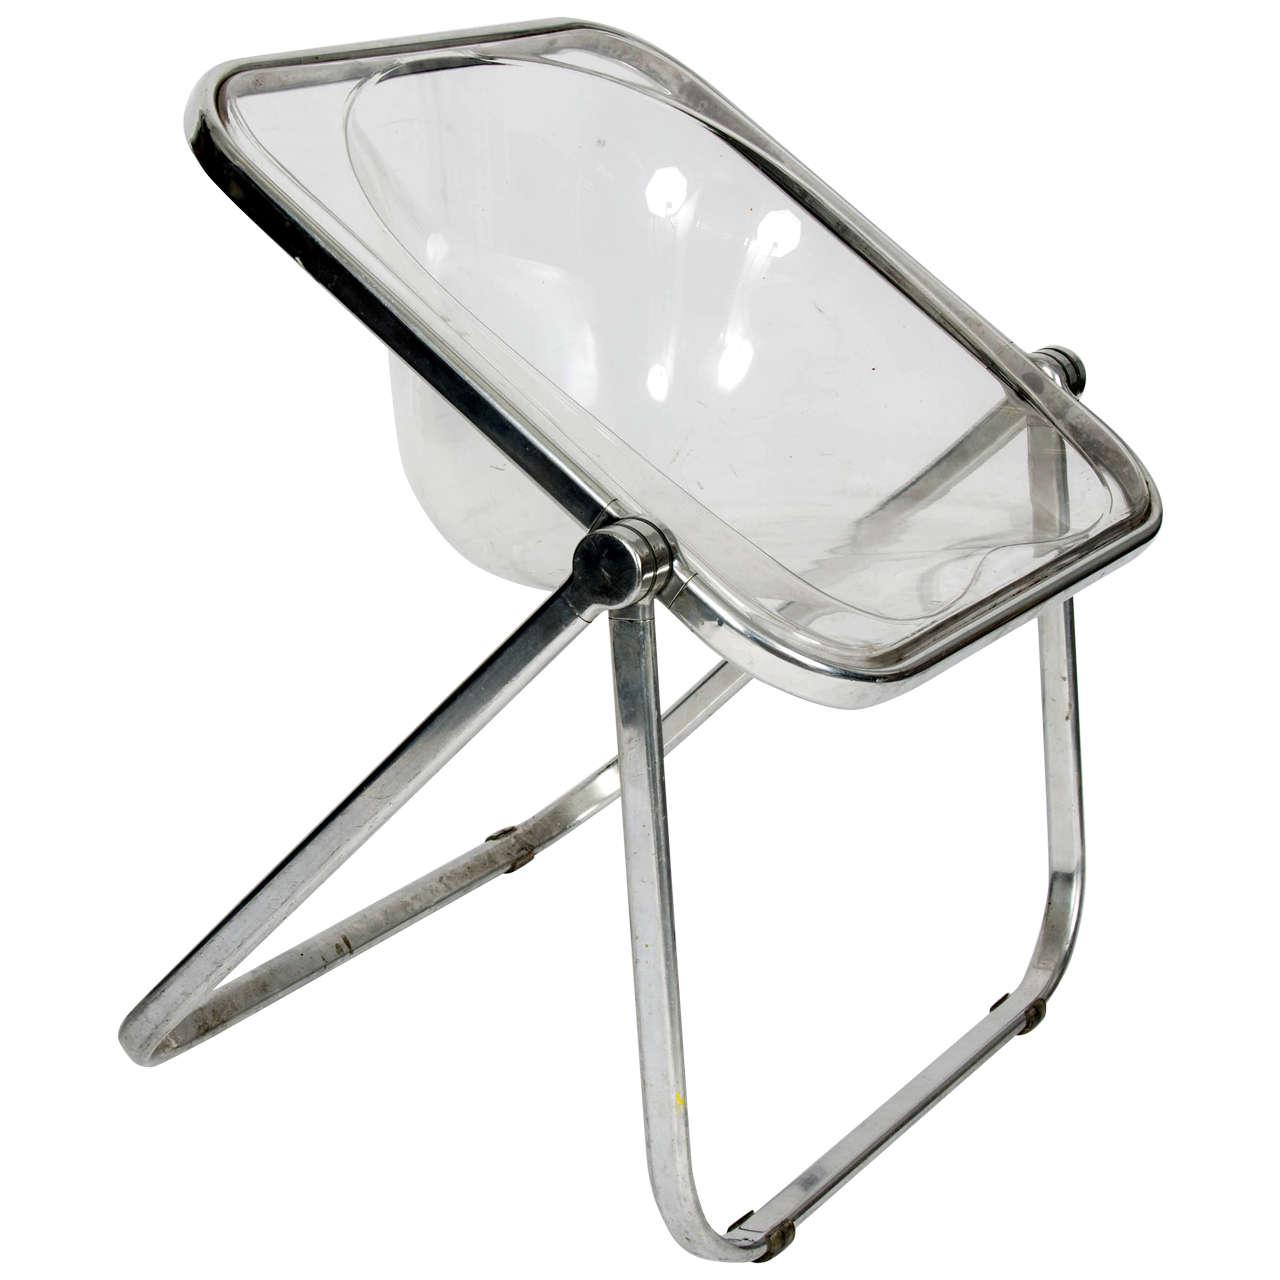 1960s Giancarlo Piretti Plia Clear Folding Chair For Sale at 1stdibs